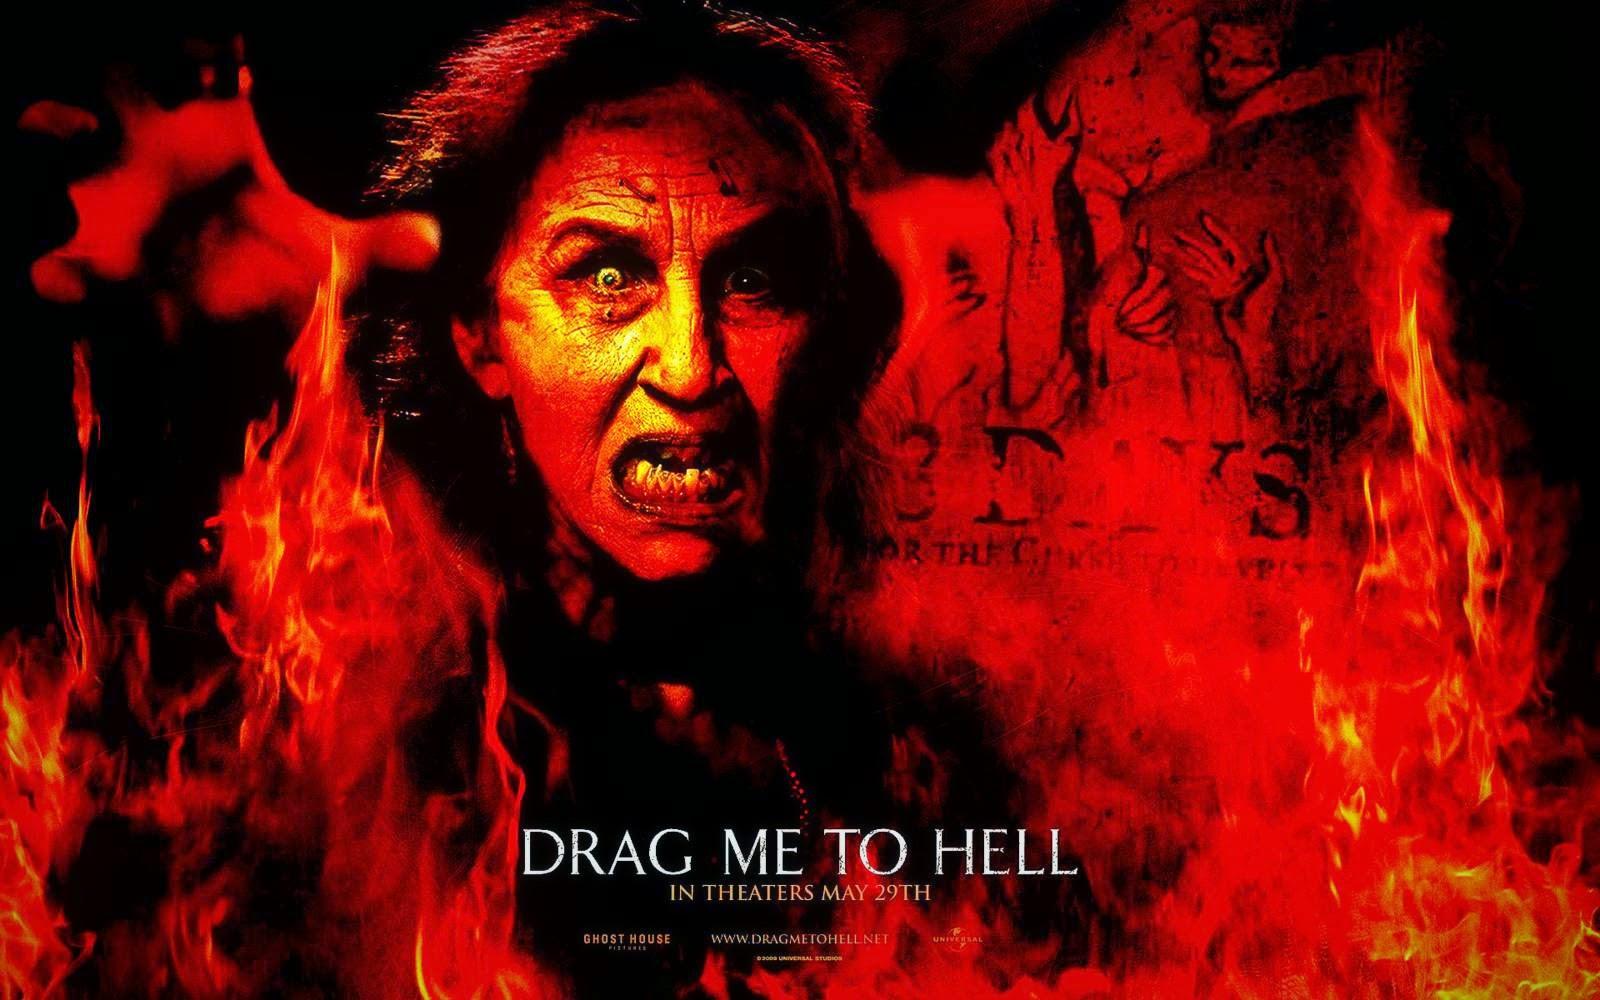 Anime Tv فيلم الرعب الخطير Drag Me To Hell 2009 بلوراي